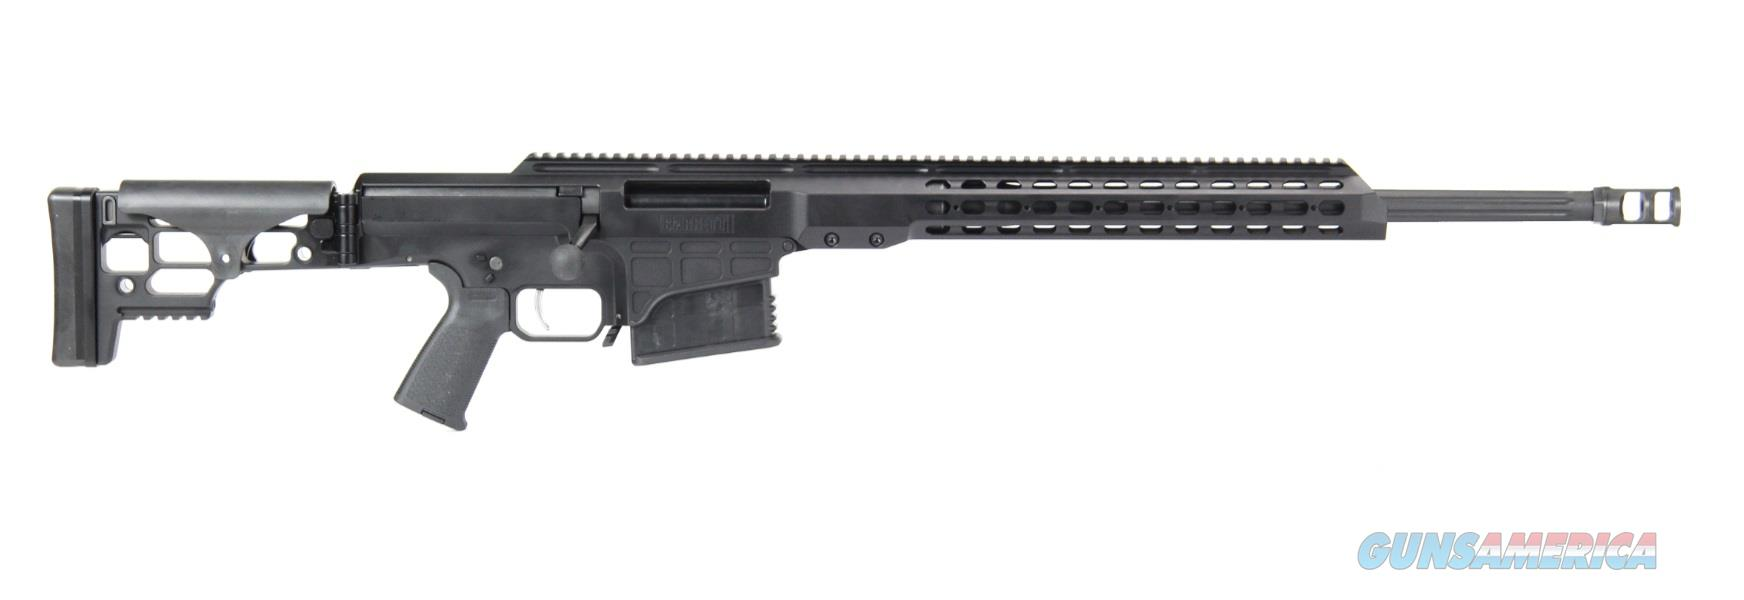 "Mrad 6.5Cr Blk 24"" 10+1 14441  Non-Guns > Iron/Metal/Peep Sights"